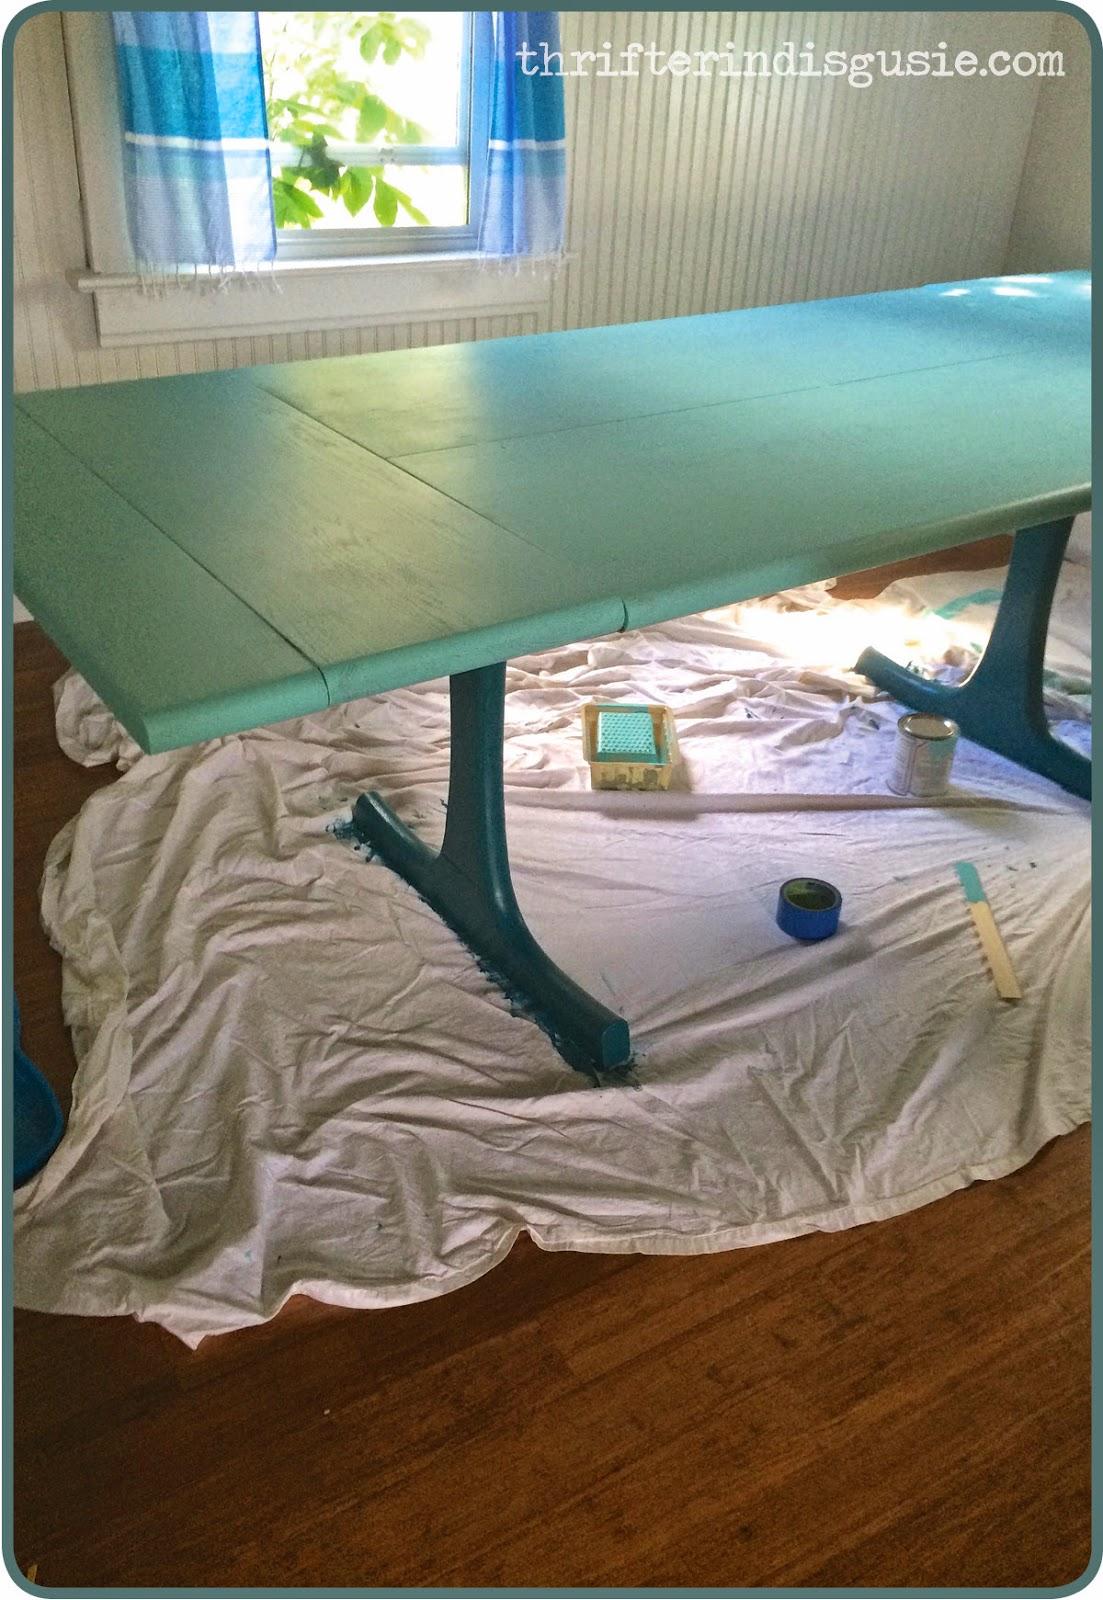 Turquoise kitchen table